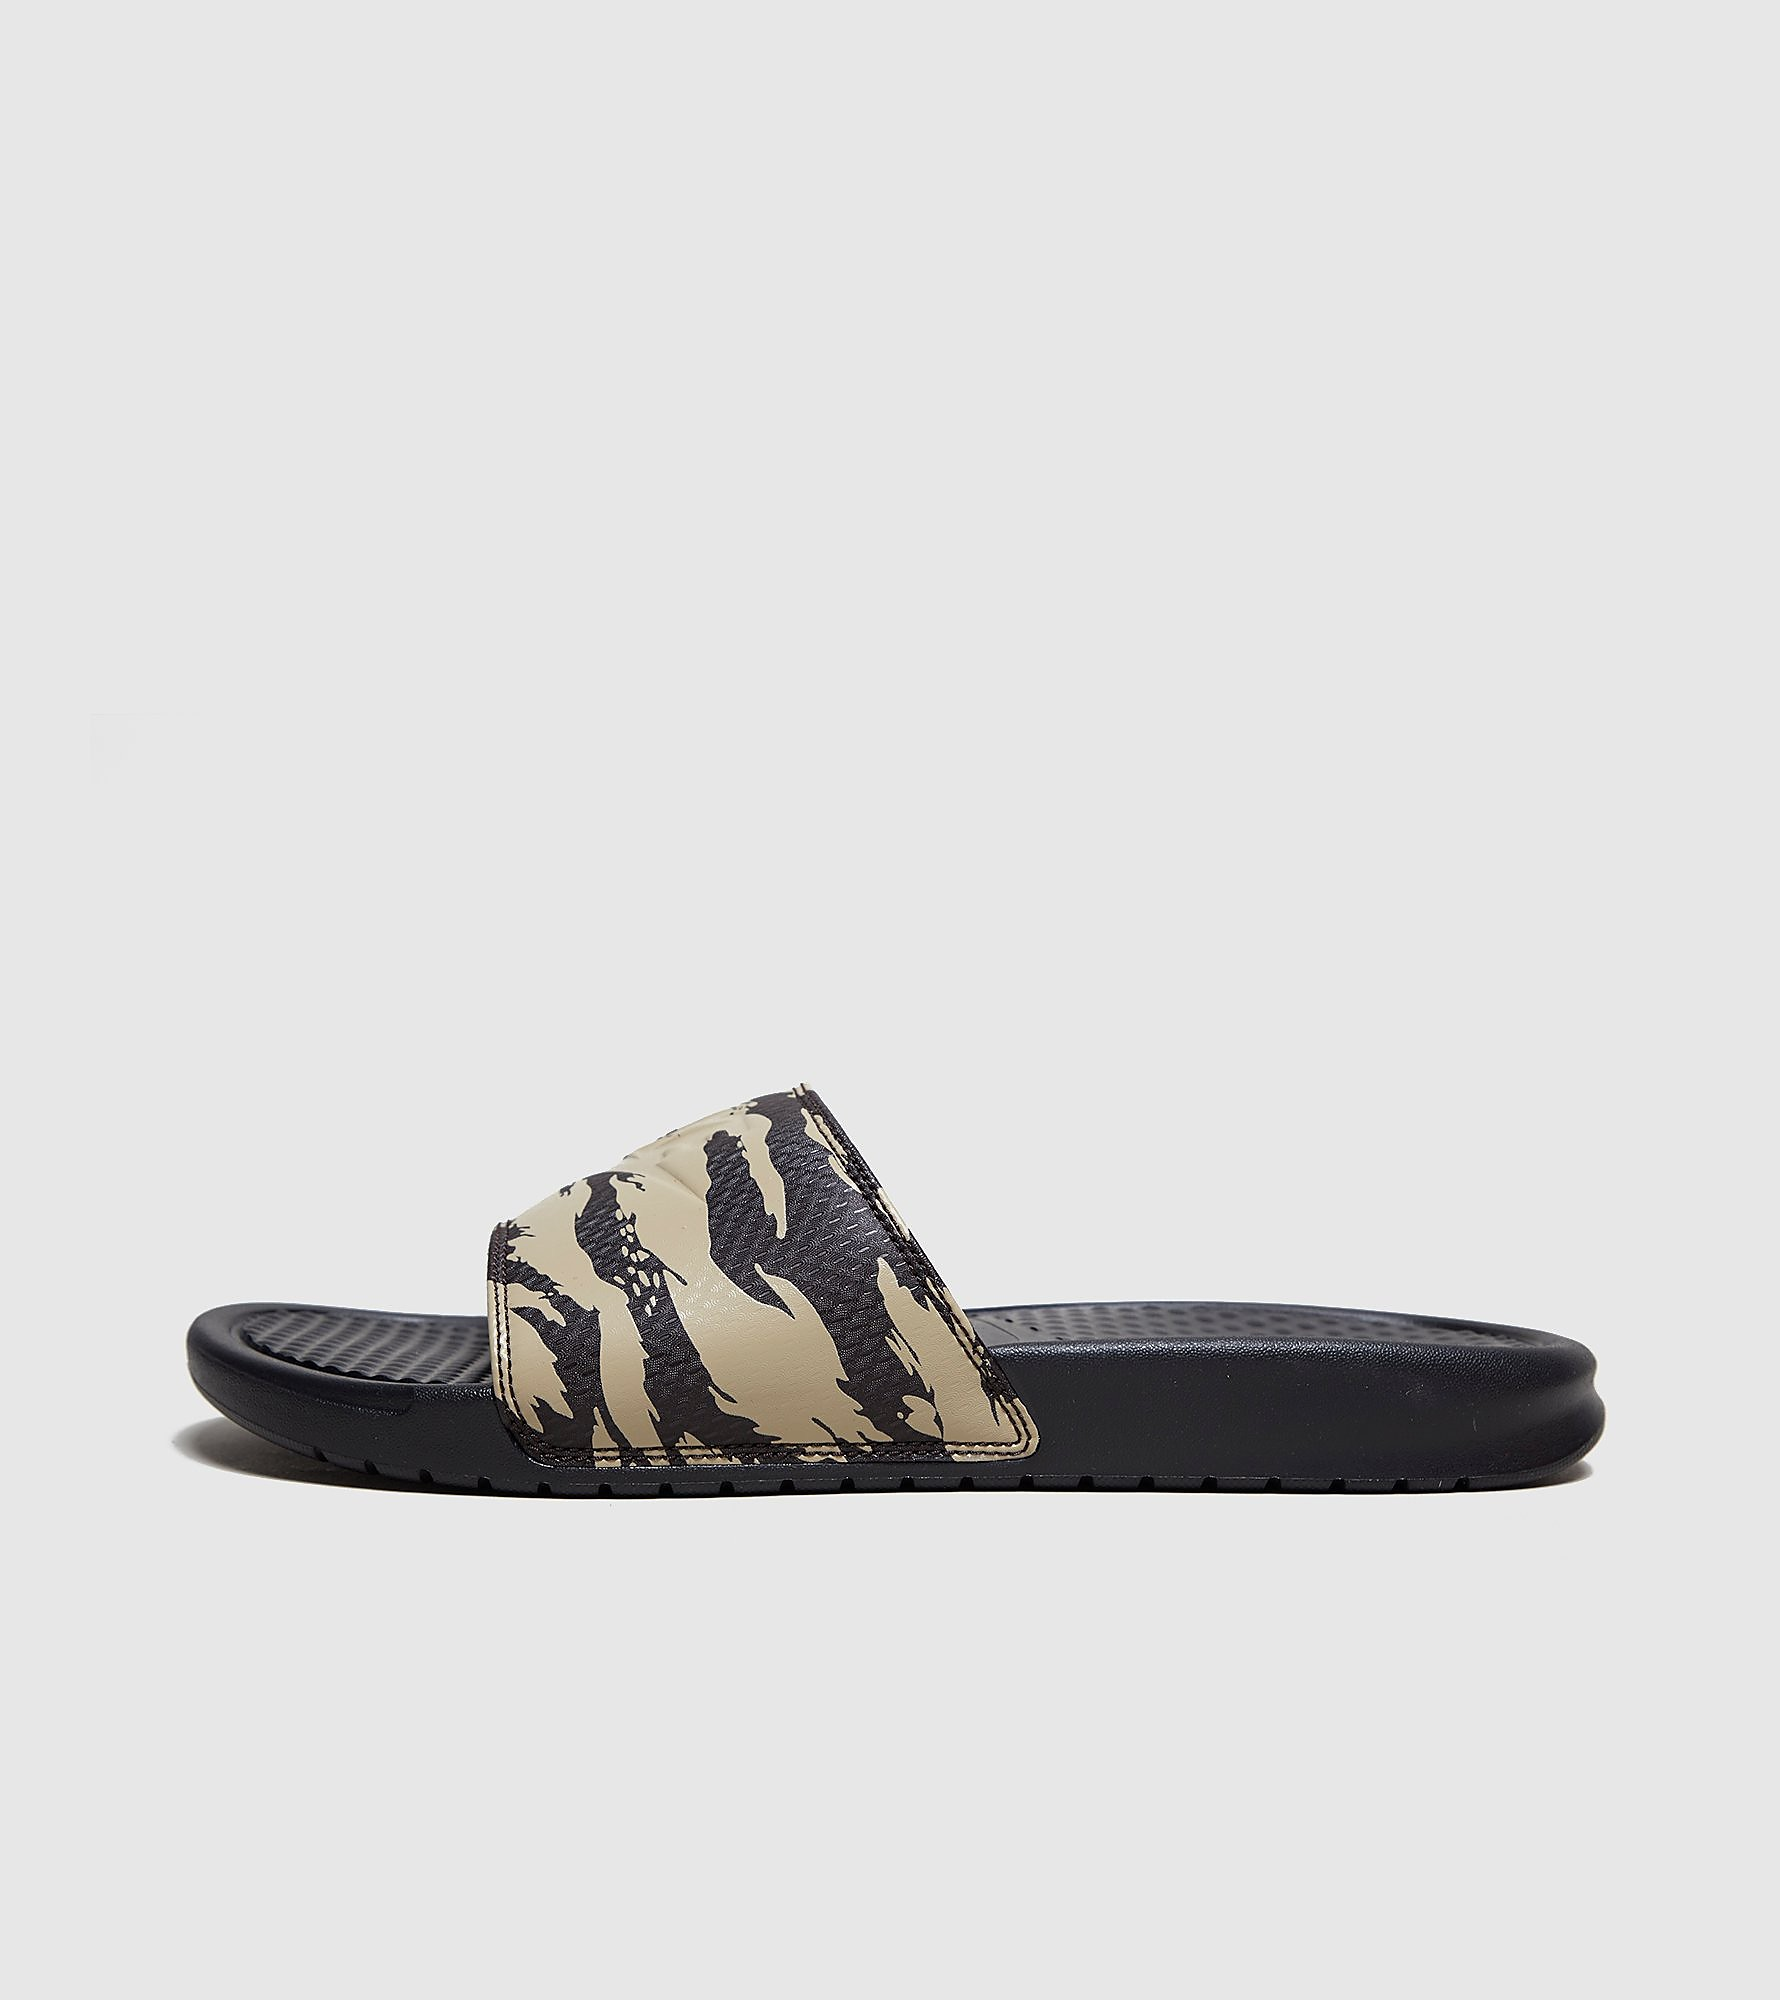 Nike Benassi Sandaler, Grn